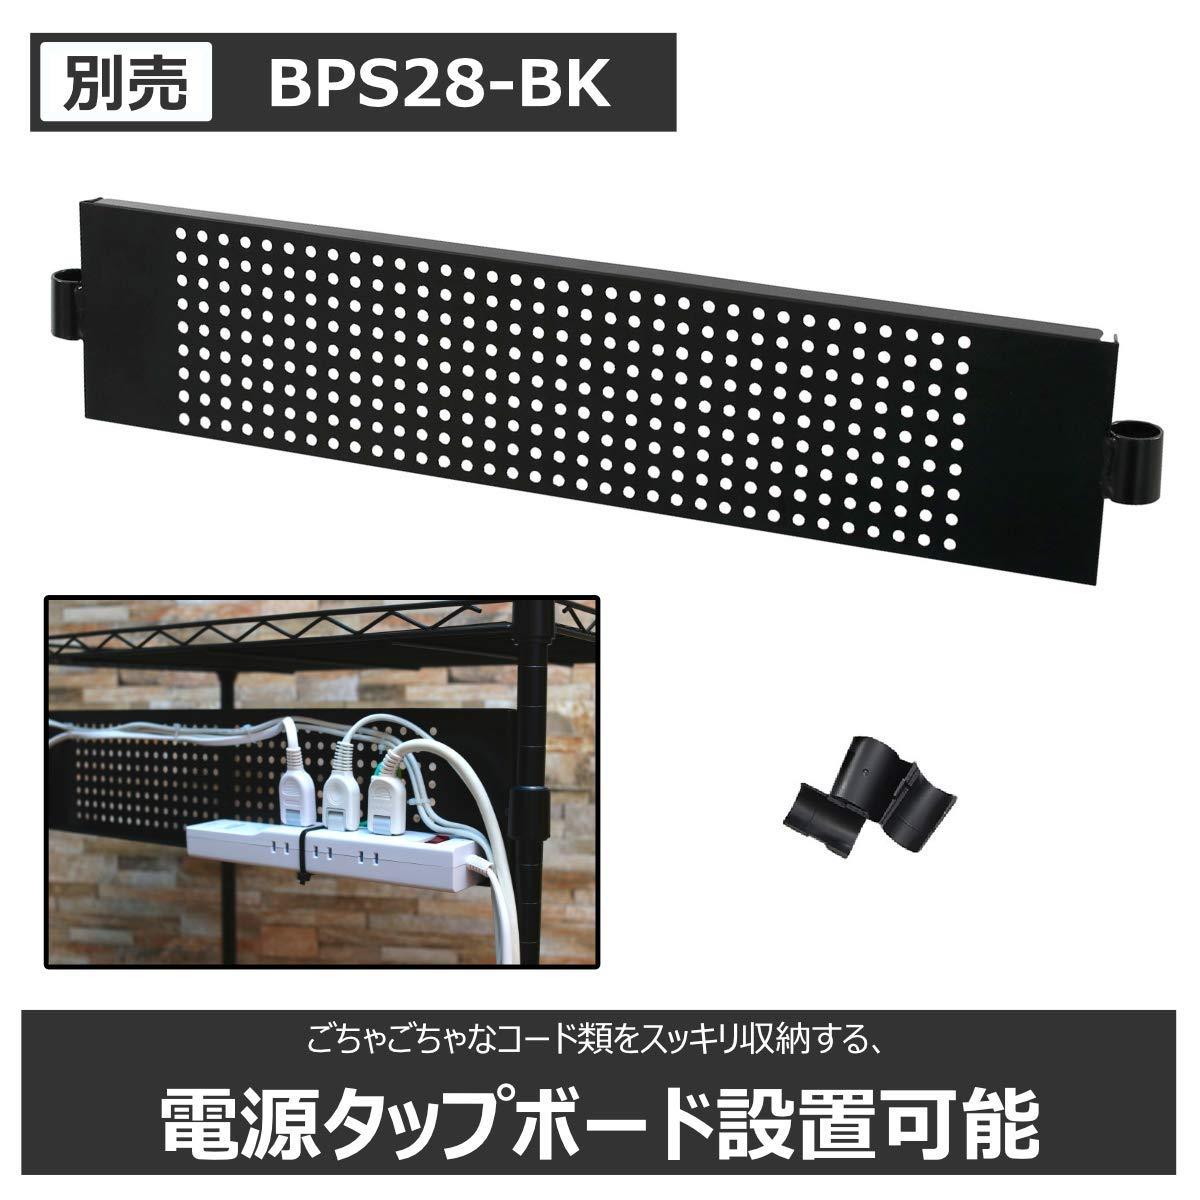 Amazon.com: Blitzer (burittuxa-) dardos soporte bsd21 – BK ...